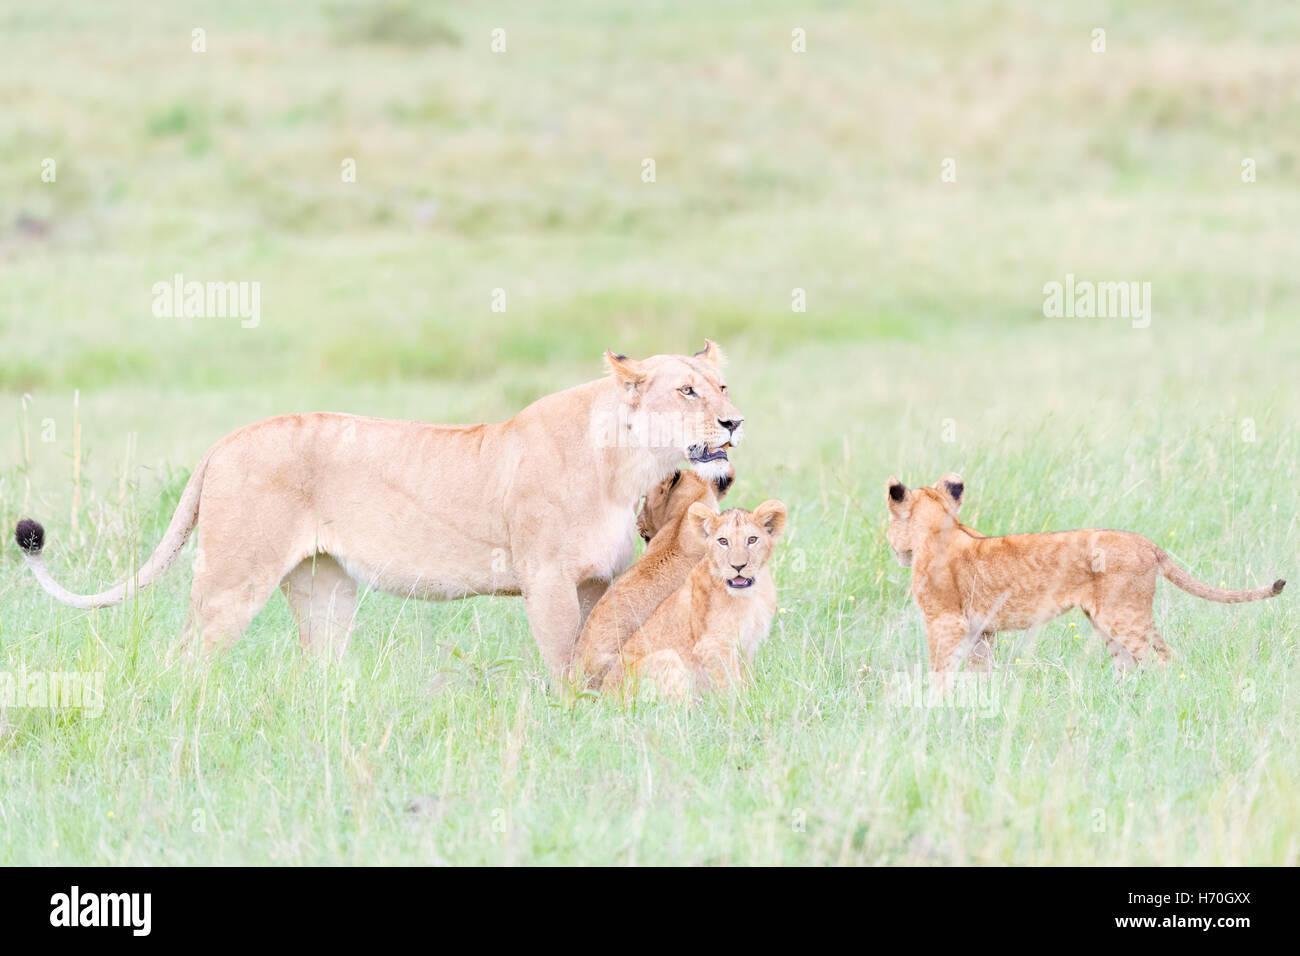 Lioness (Panthera leo) greeting cubs, Maasai Mara national reserve, Kenya - Stock Image